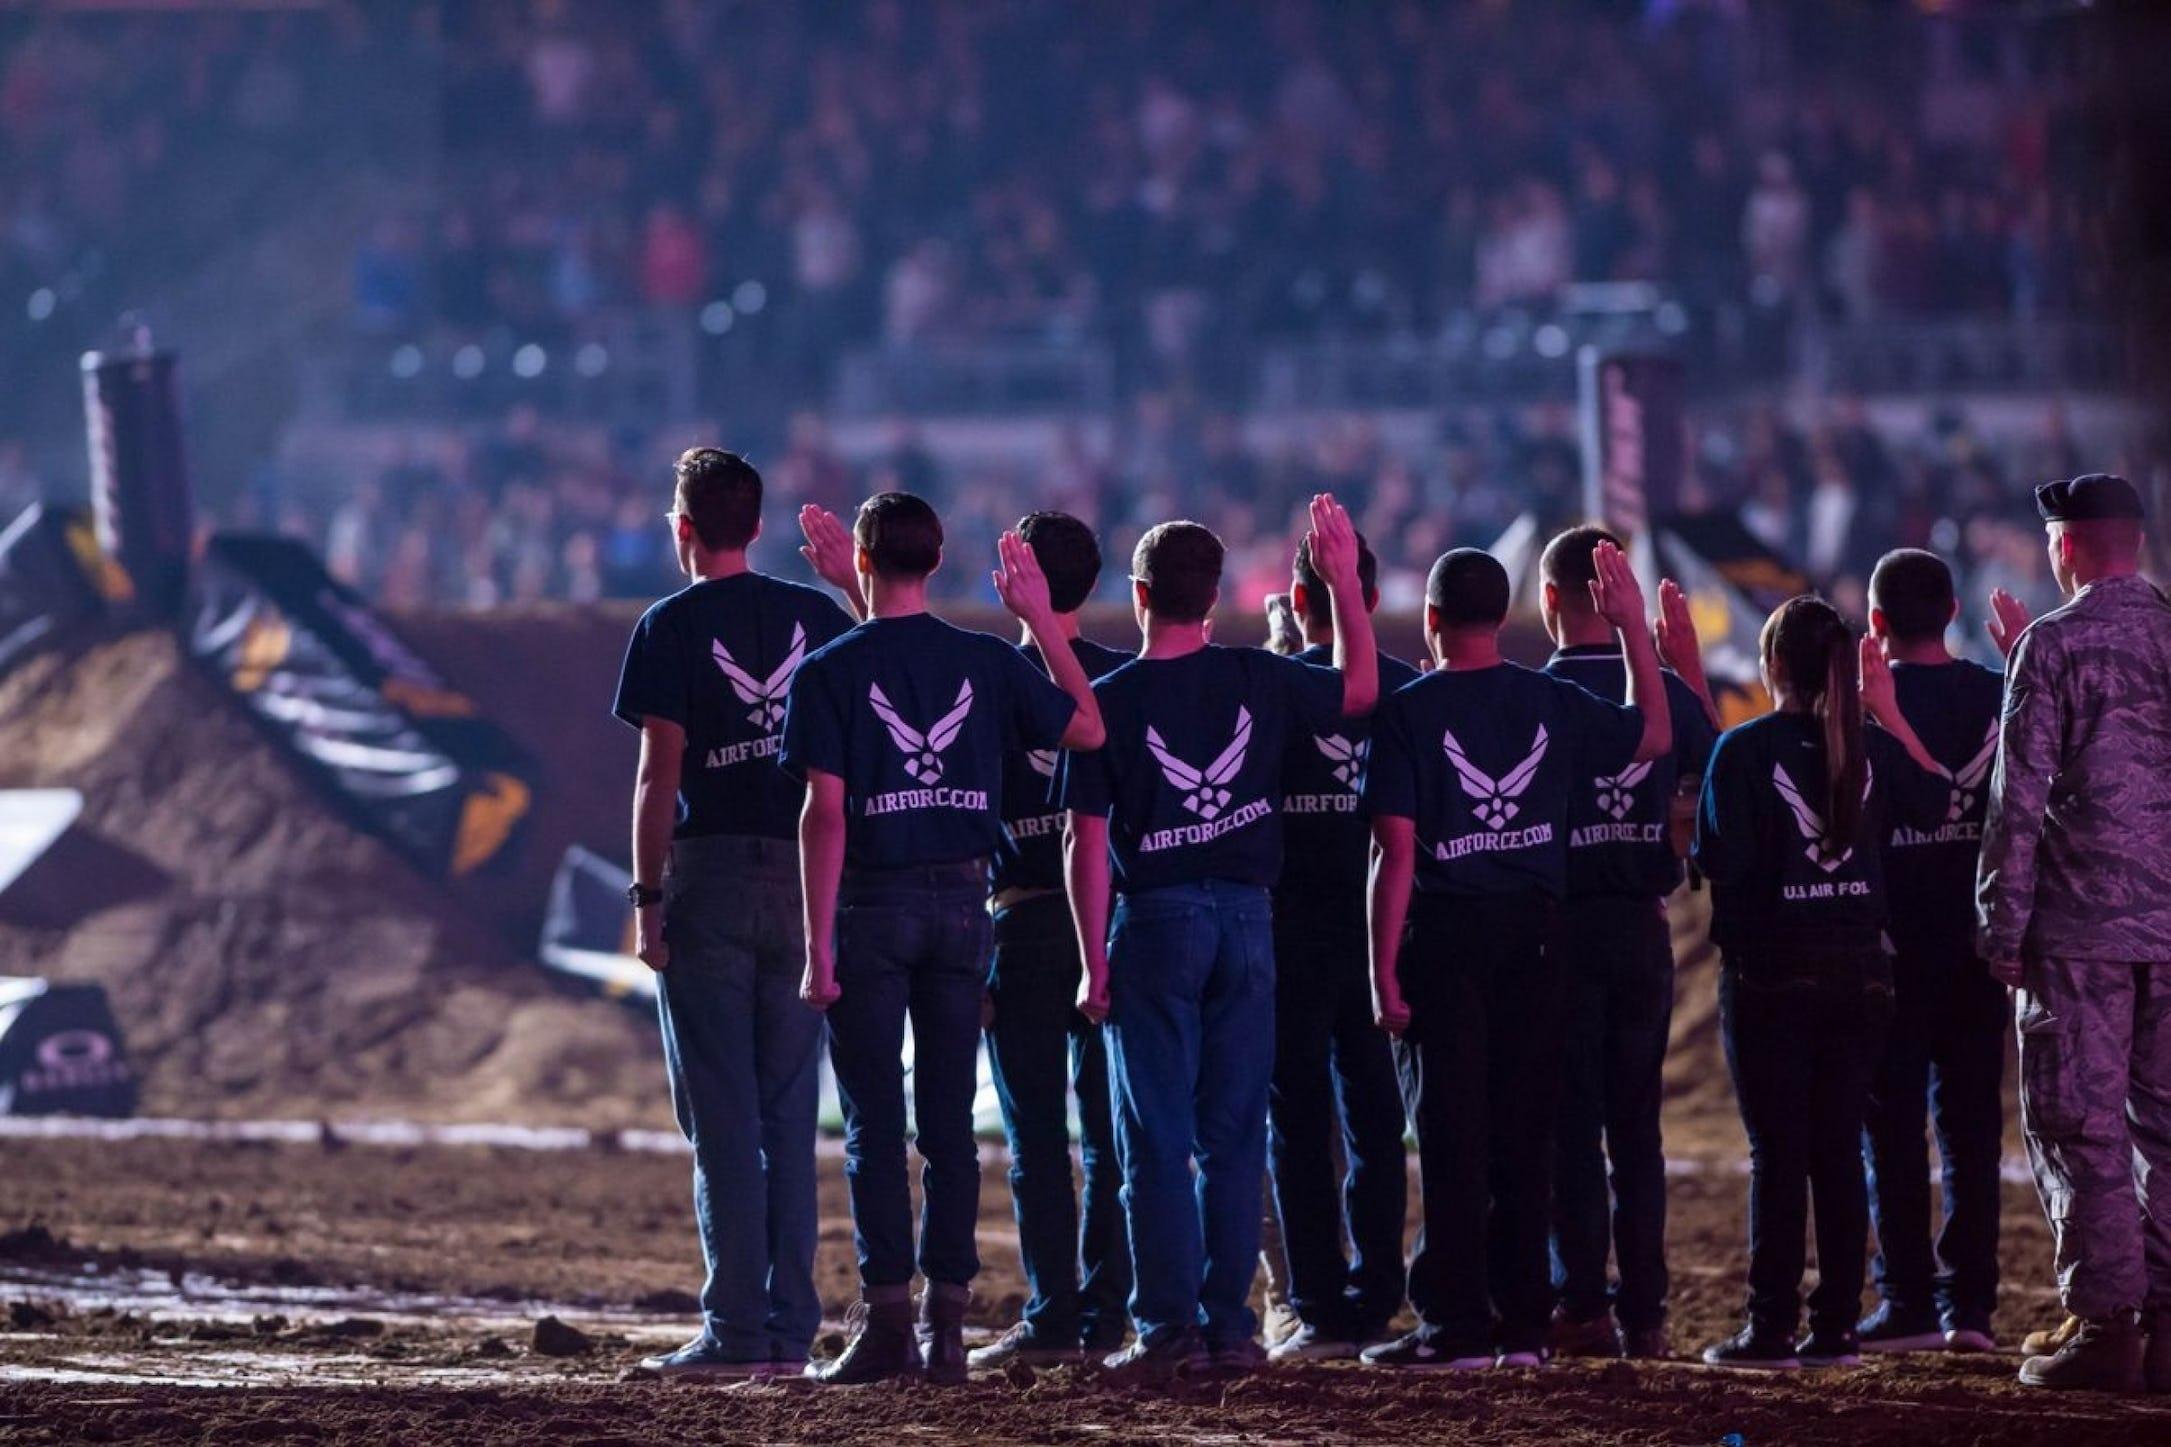 Racer X Military Hero Winners Announced